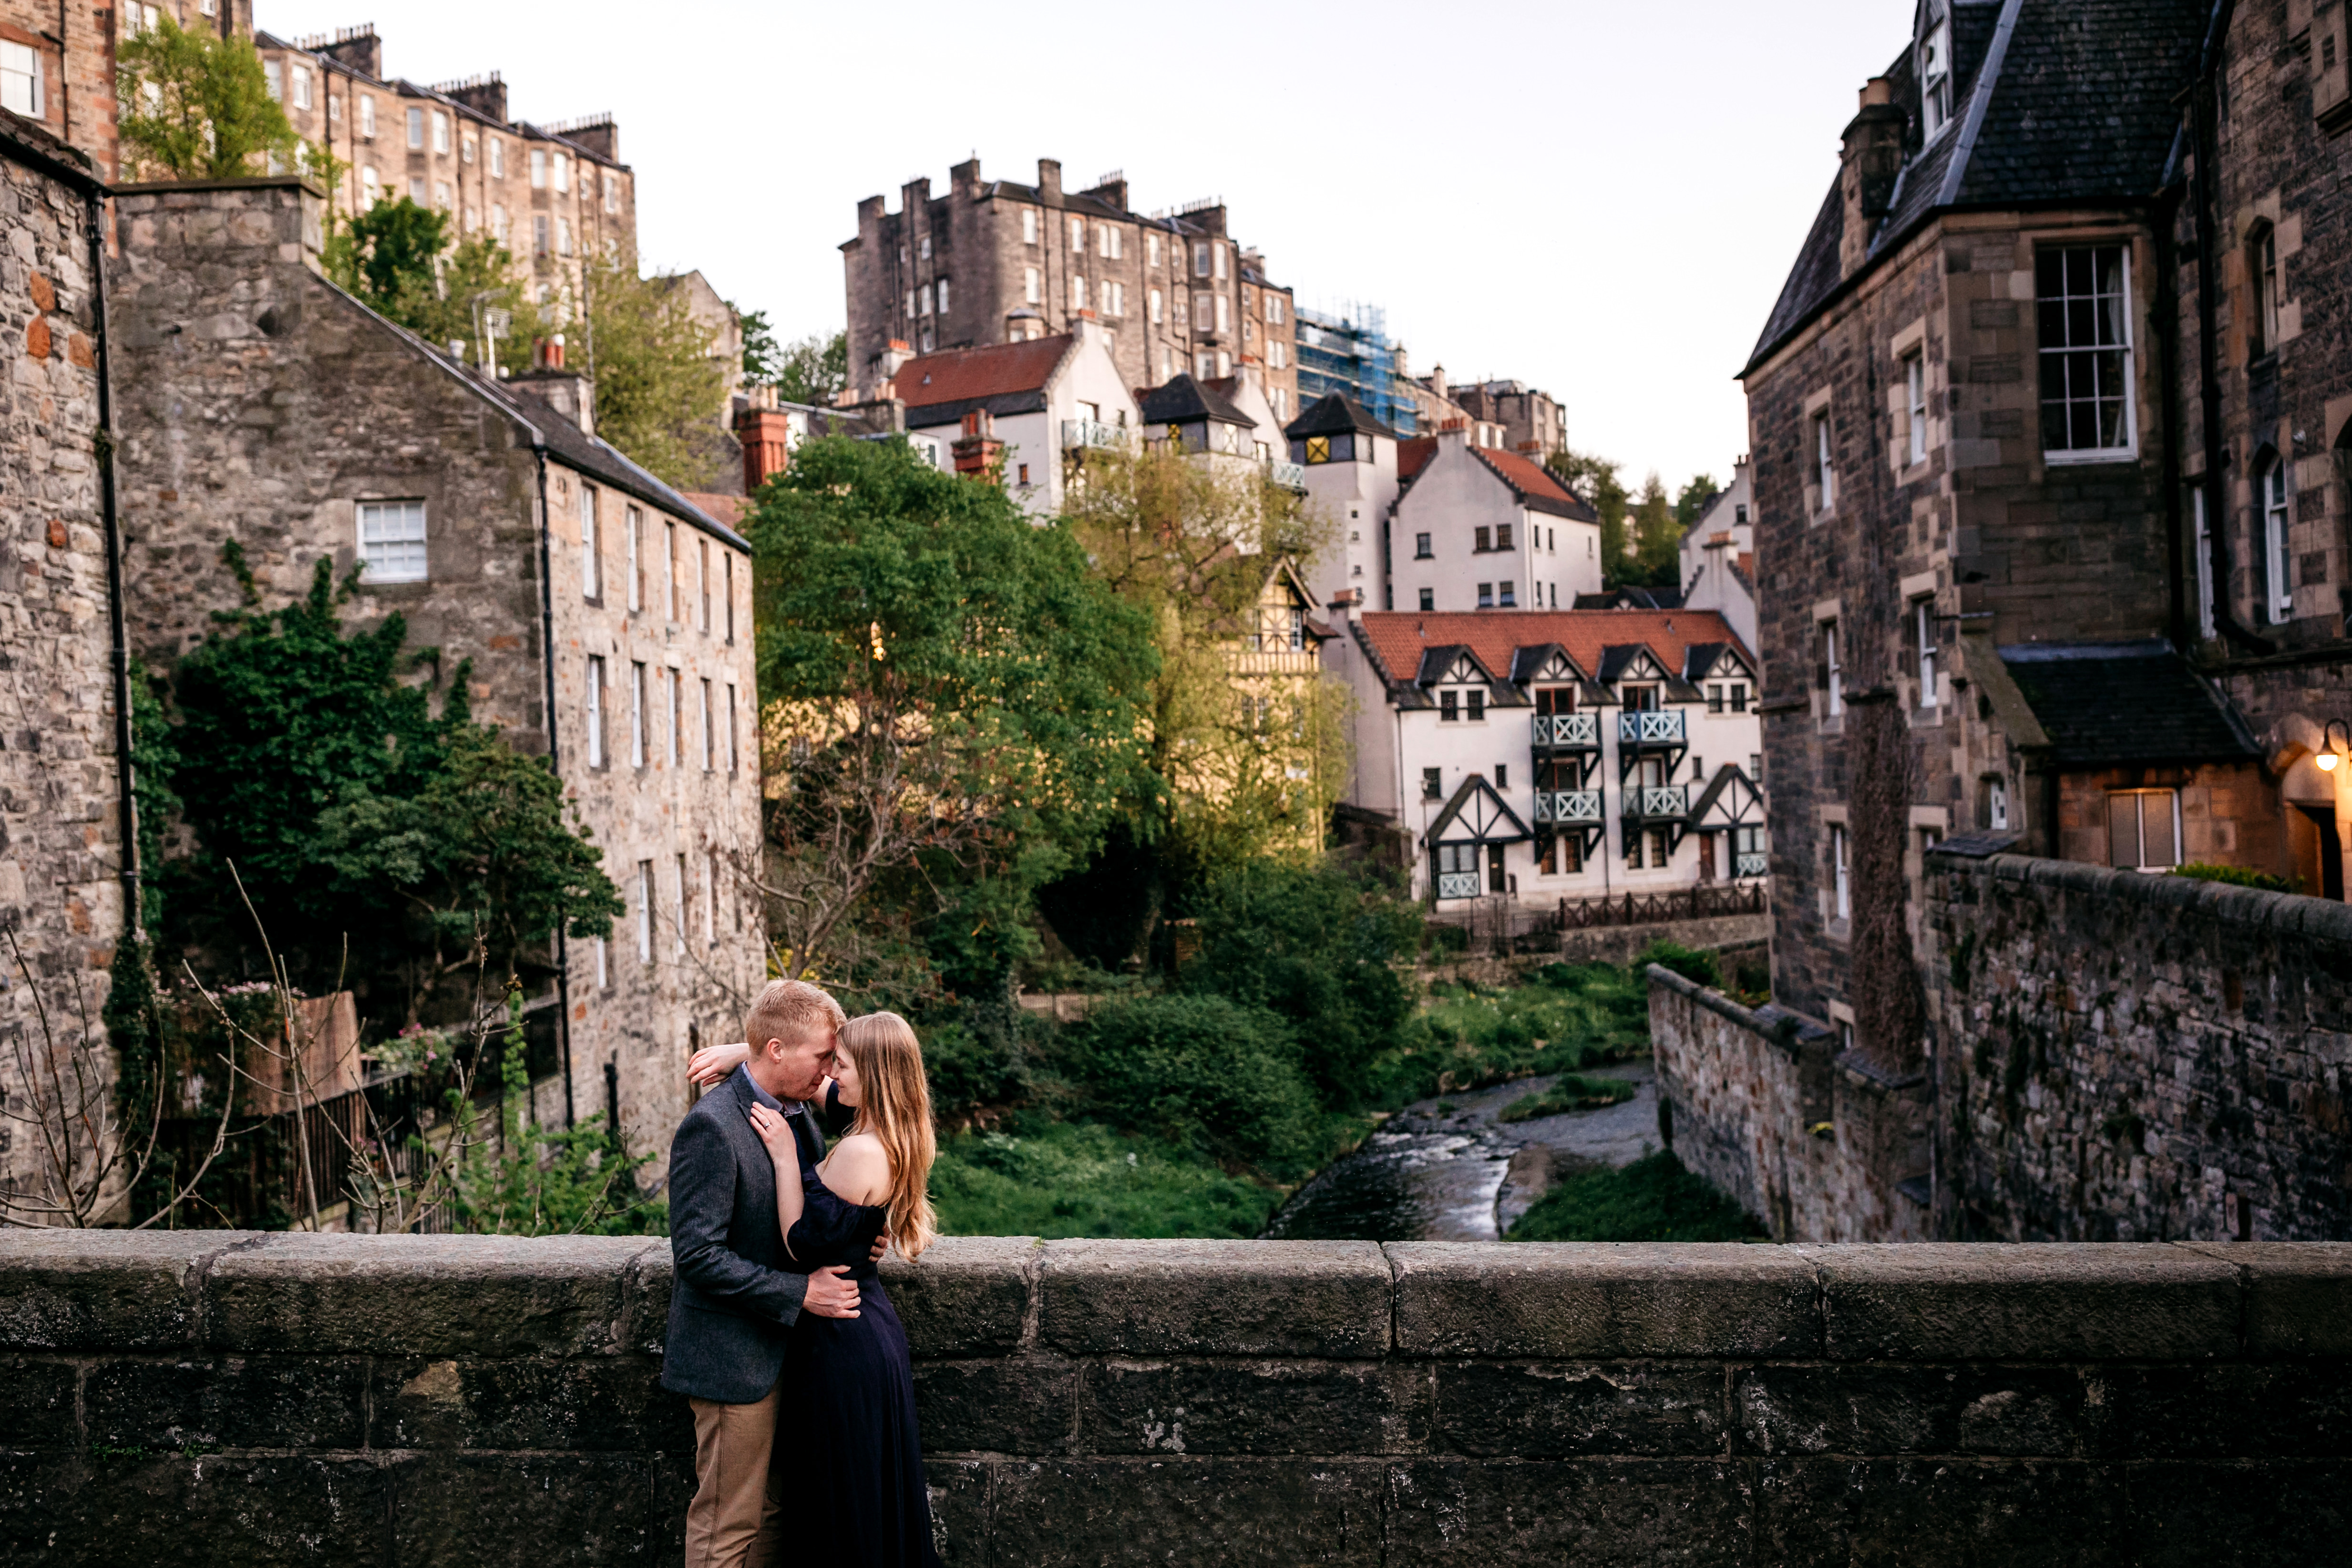 Ines + Neil - Couple's Session - Edinburugh, Scotland, UK - Christie Q Photography - 152- CBQQ2283